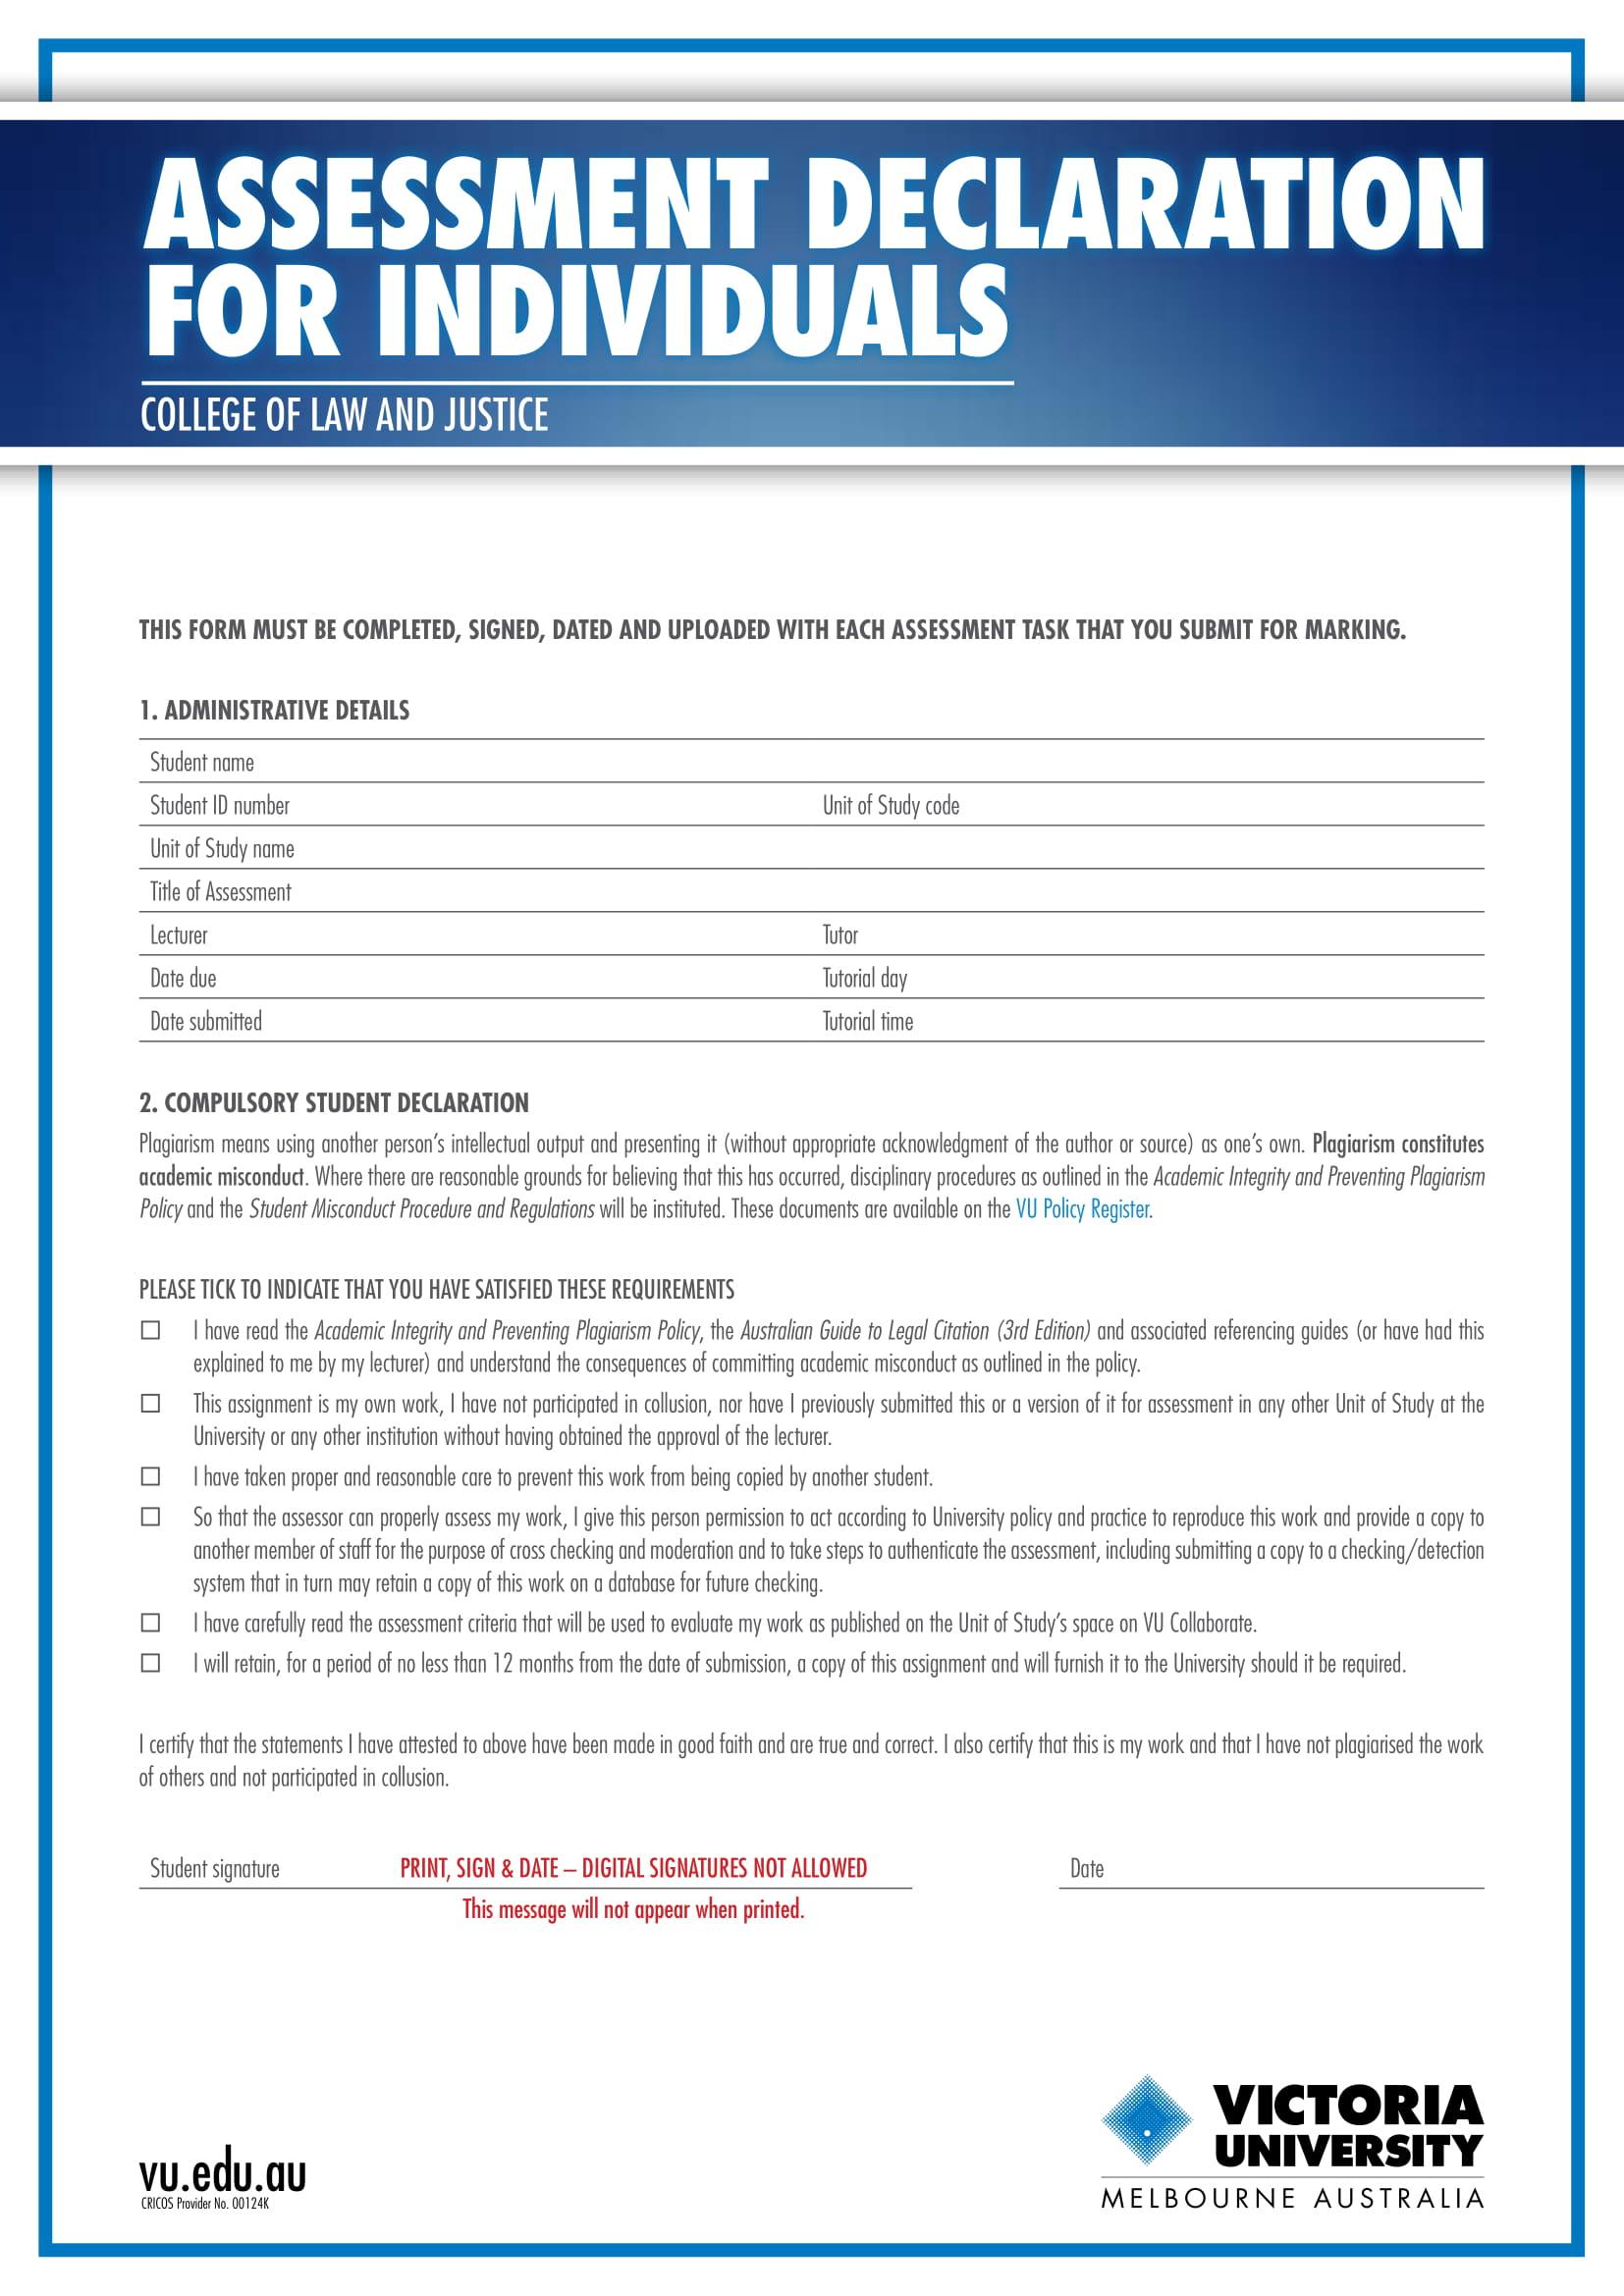 assessment declaration for individuals 1